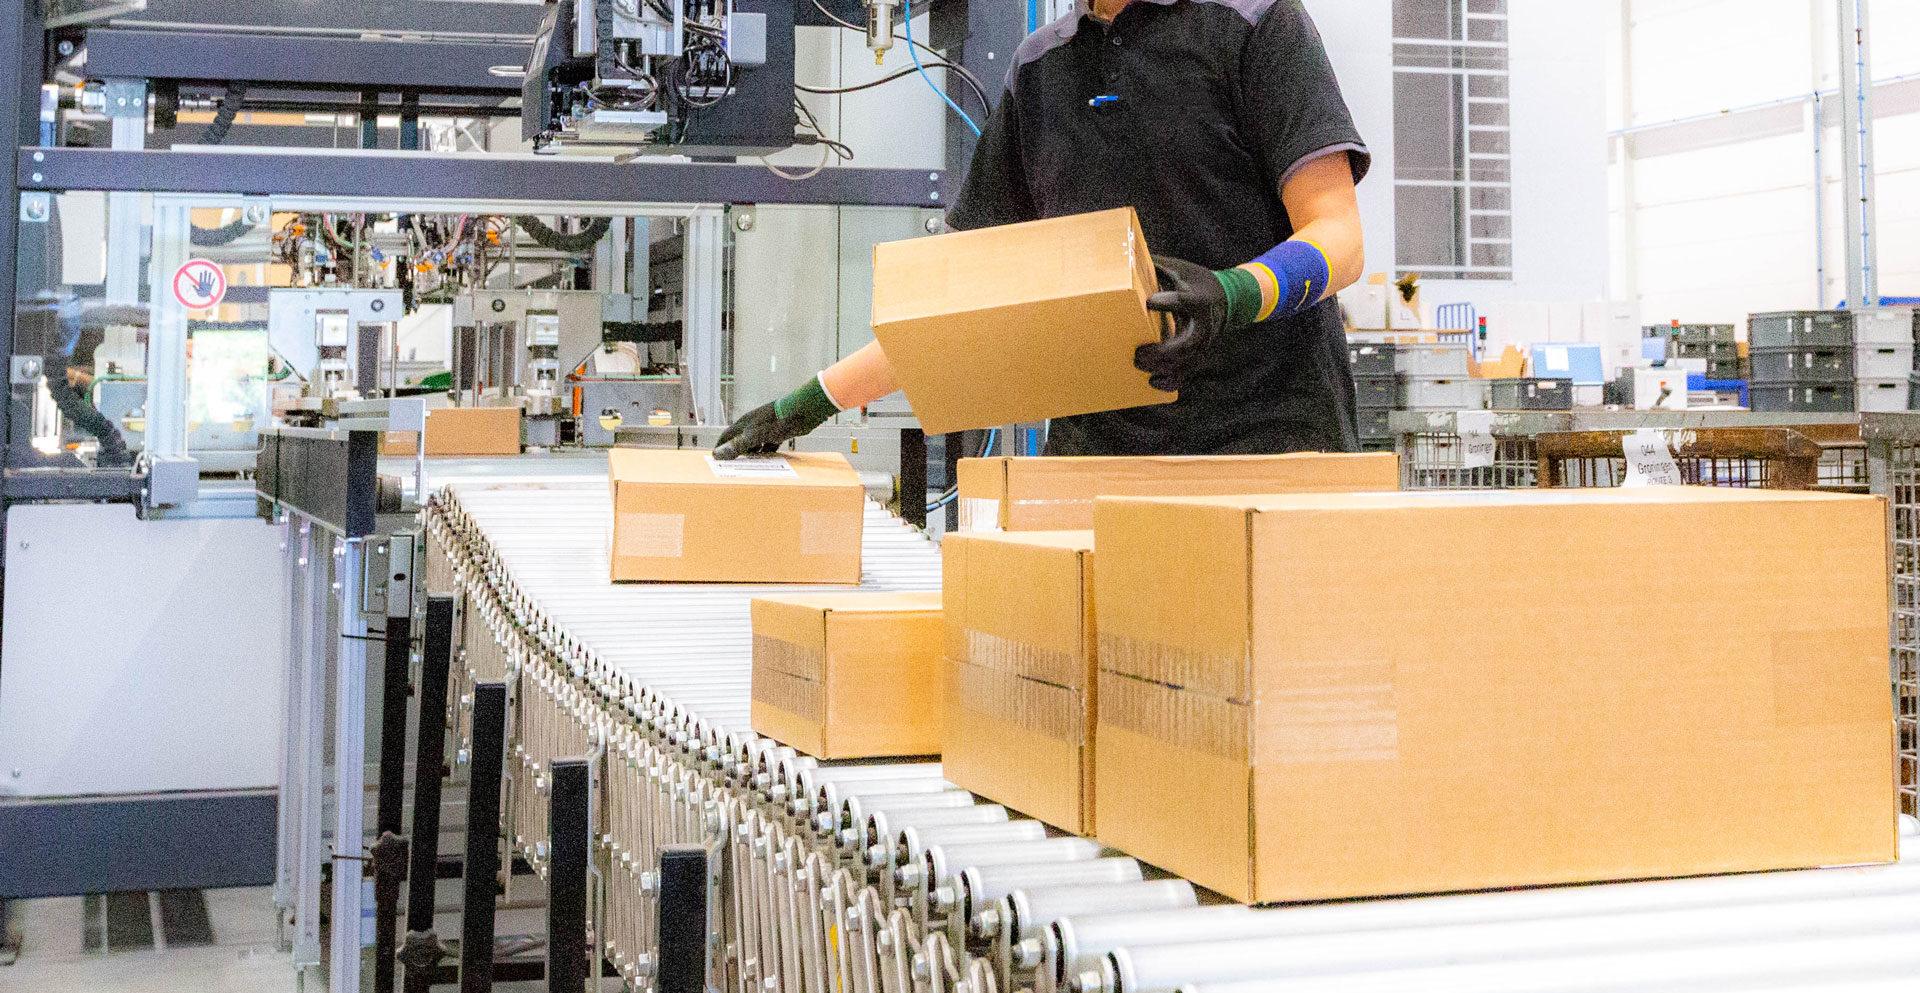 Betrouwbaar verpakkingsproces